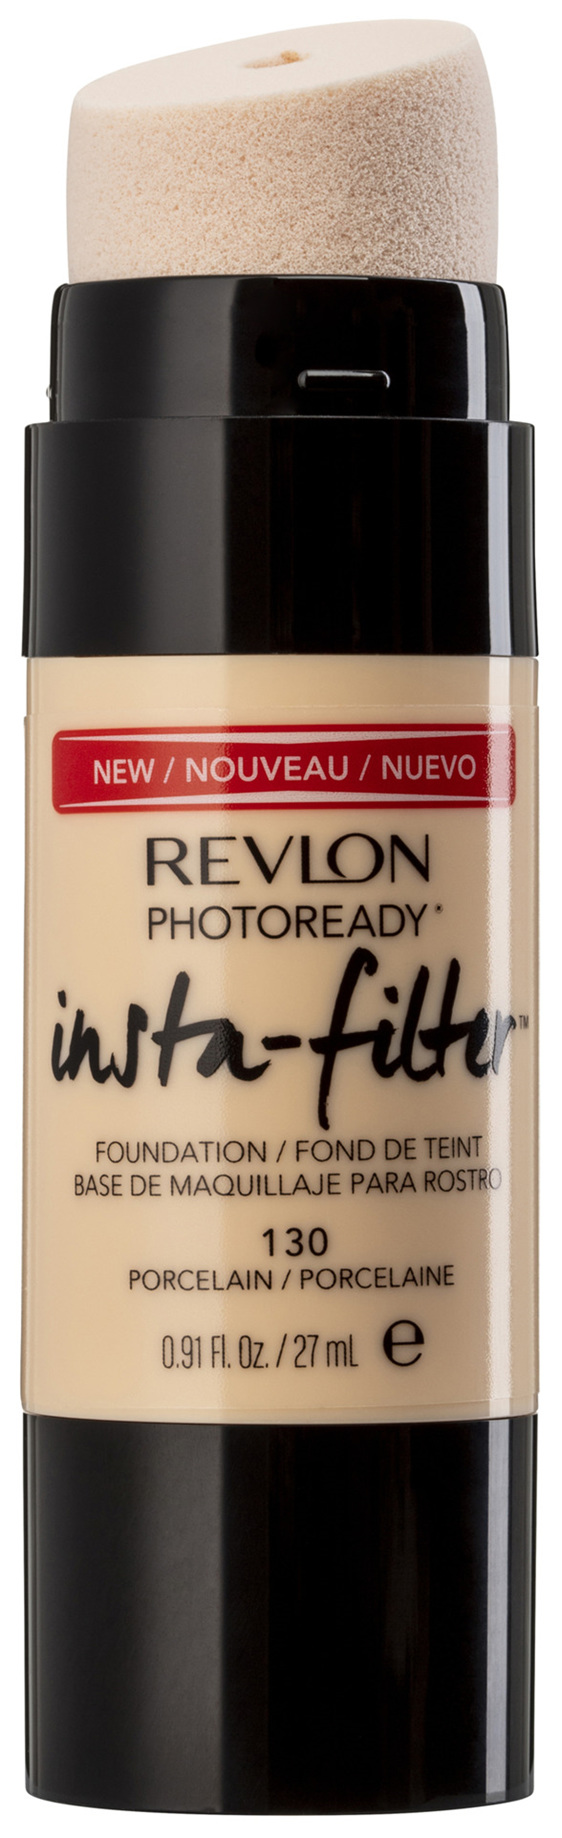 Revlon Photoready Insta-Filter™ Foundation Porcelain